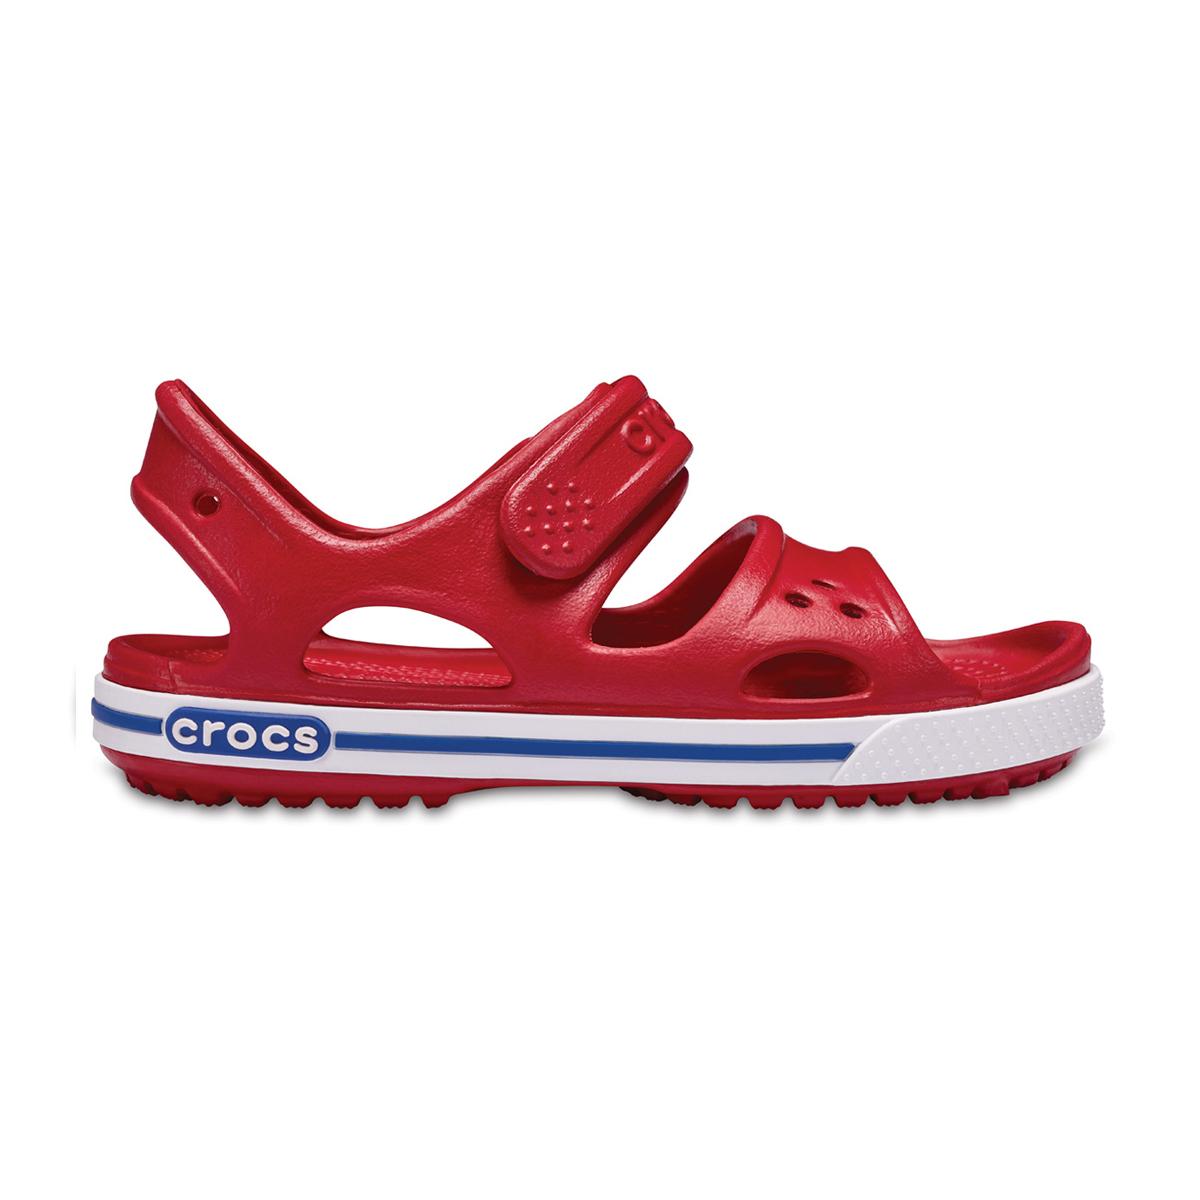 Crocs Crocband II Sandal PS - Biber/Mavi Jean